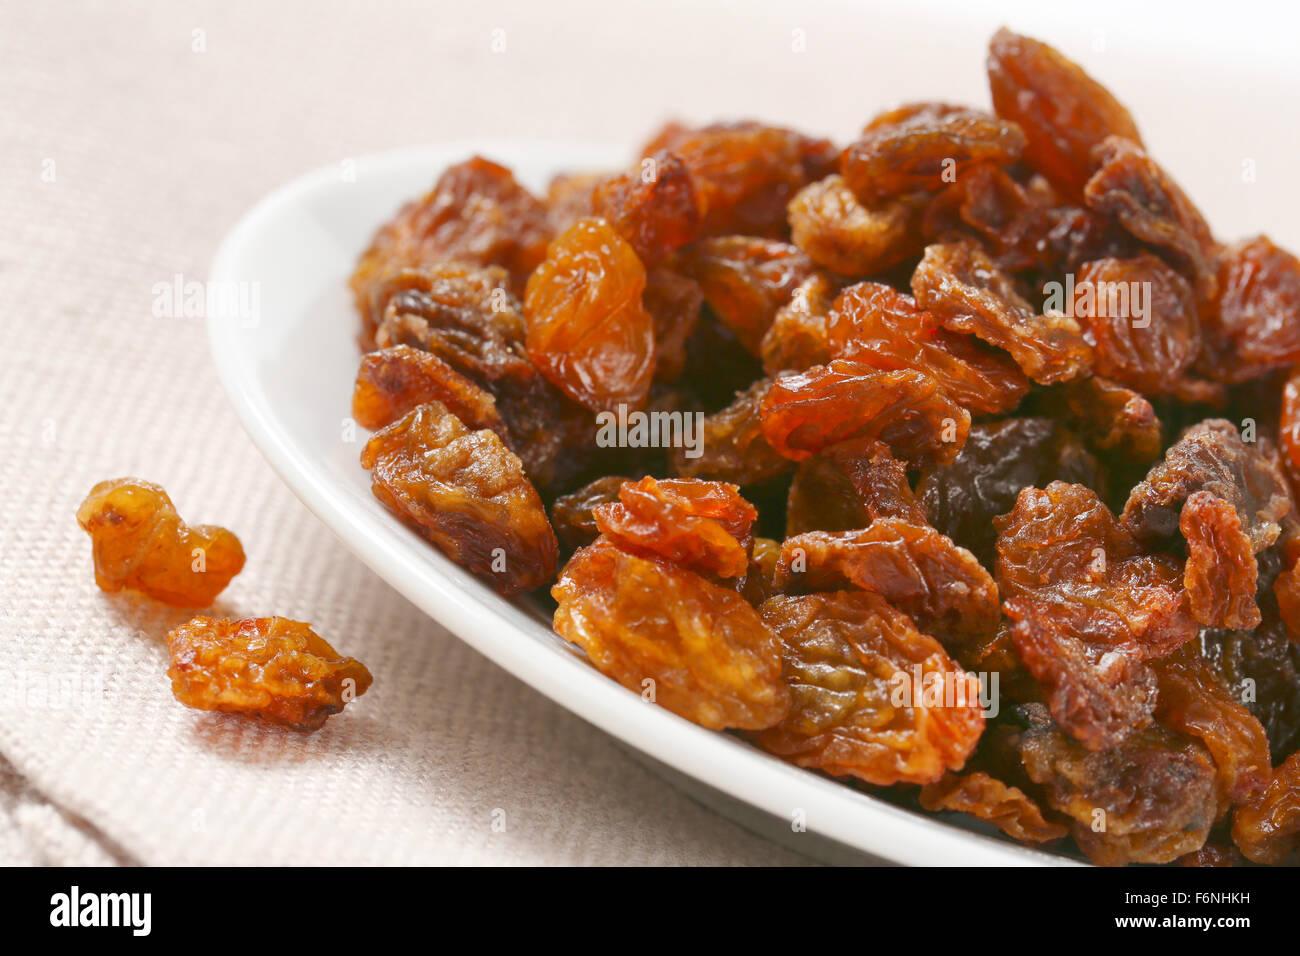 detail of raisins on white plate - Stock Image